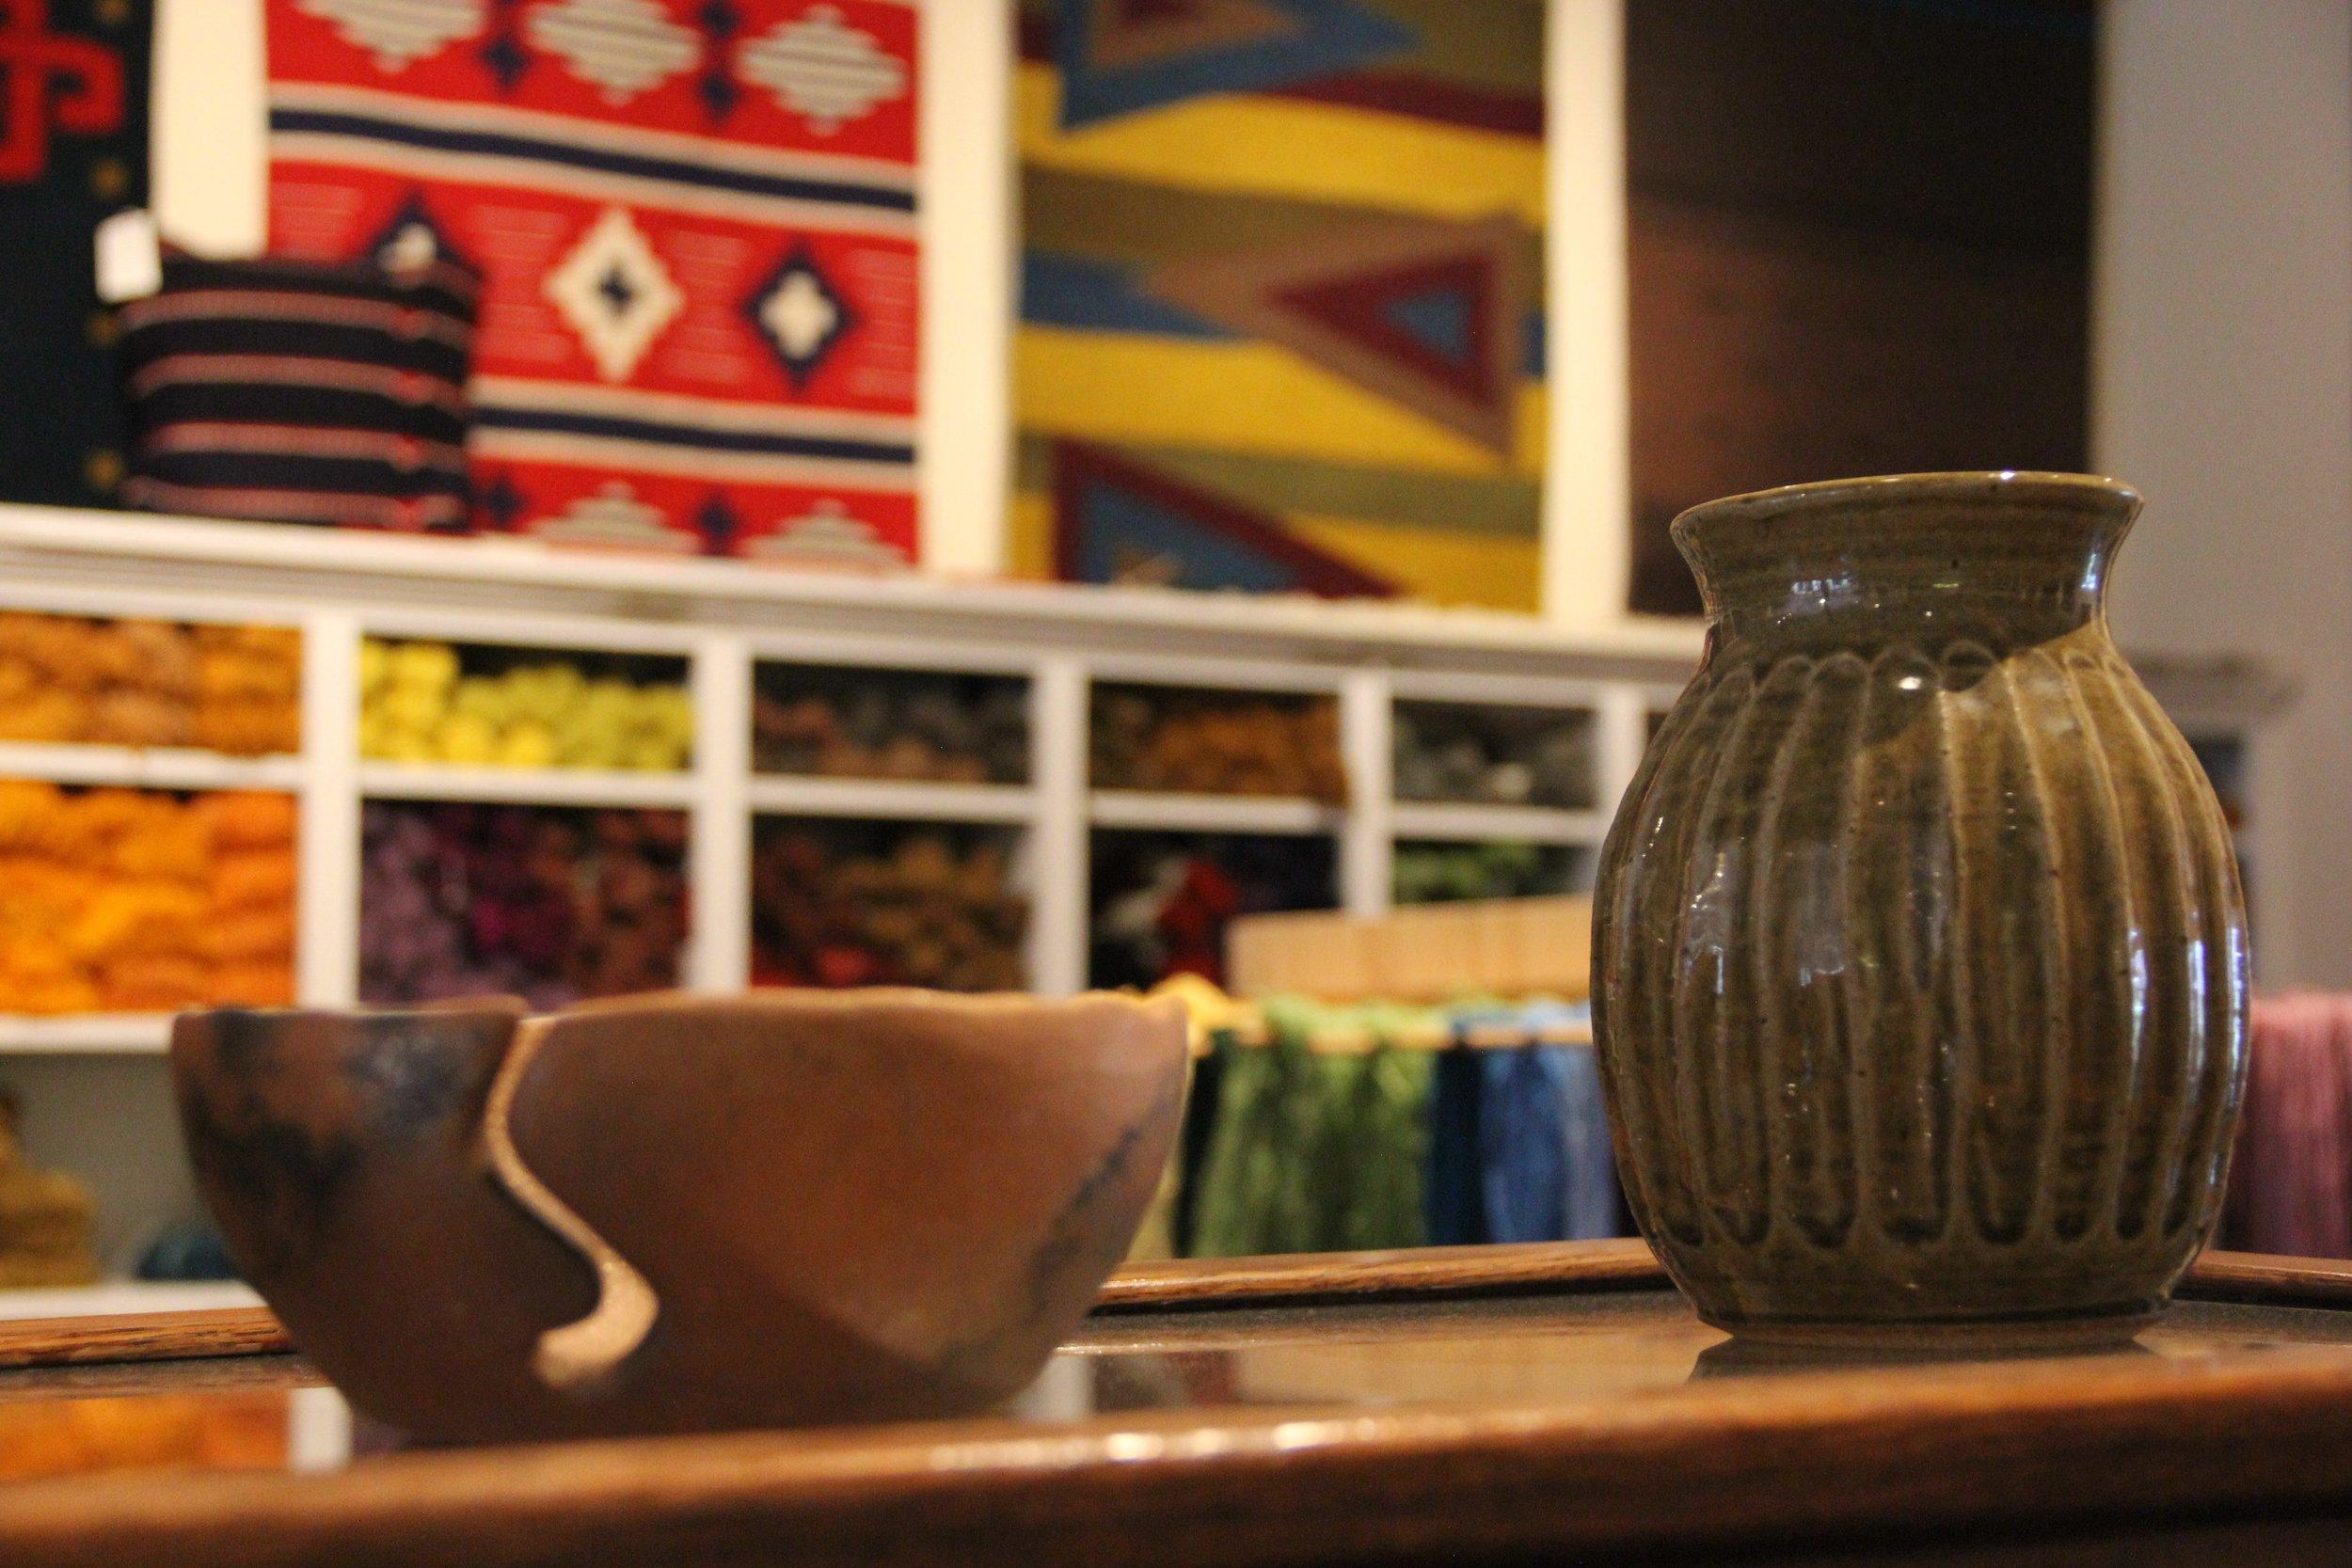 Hand-made art by local artisans